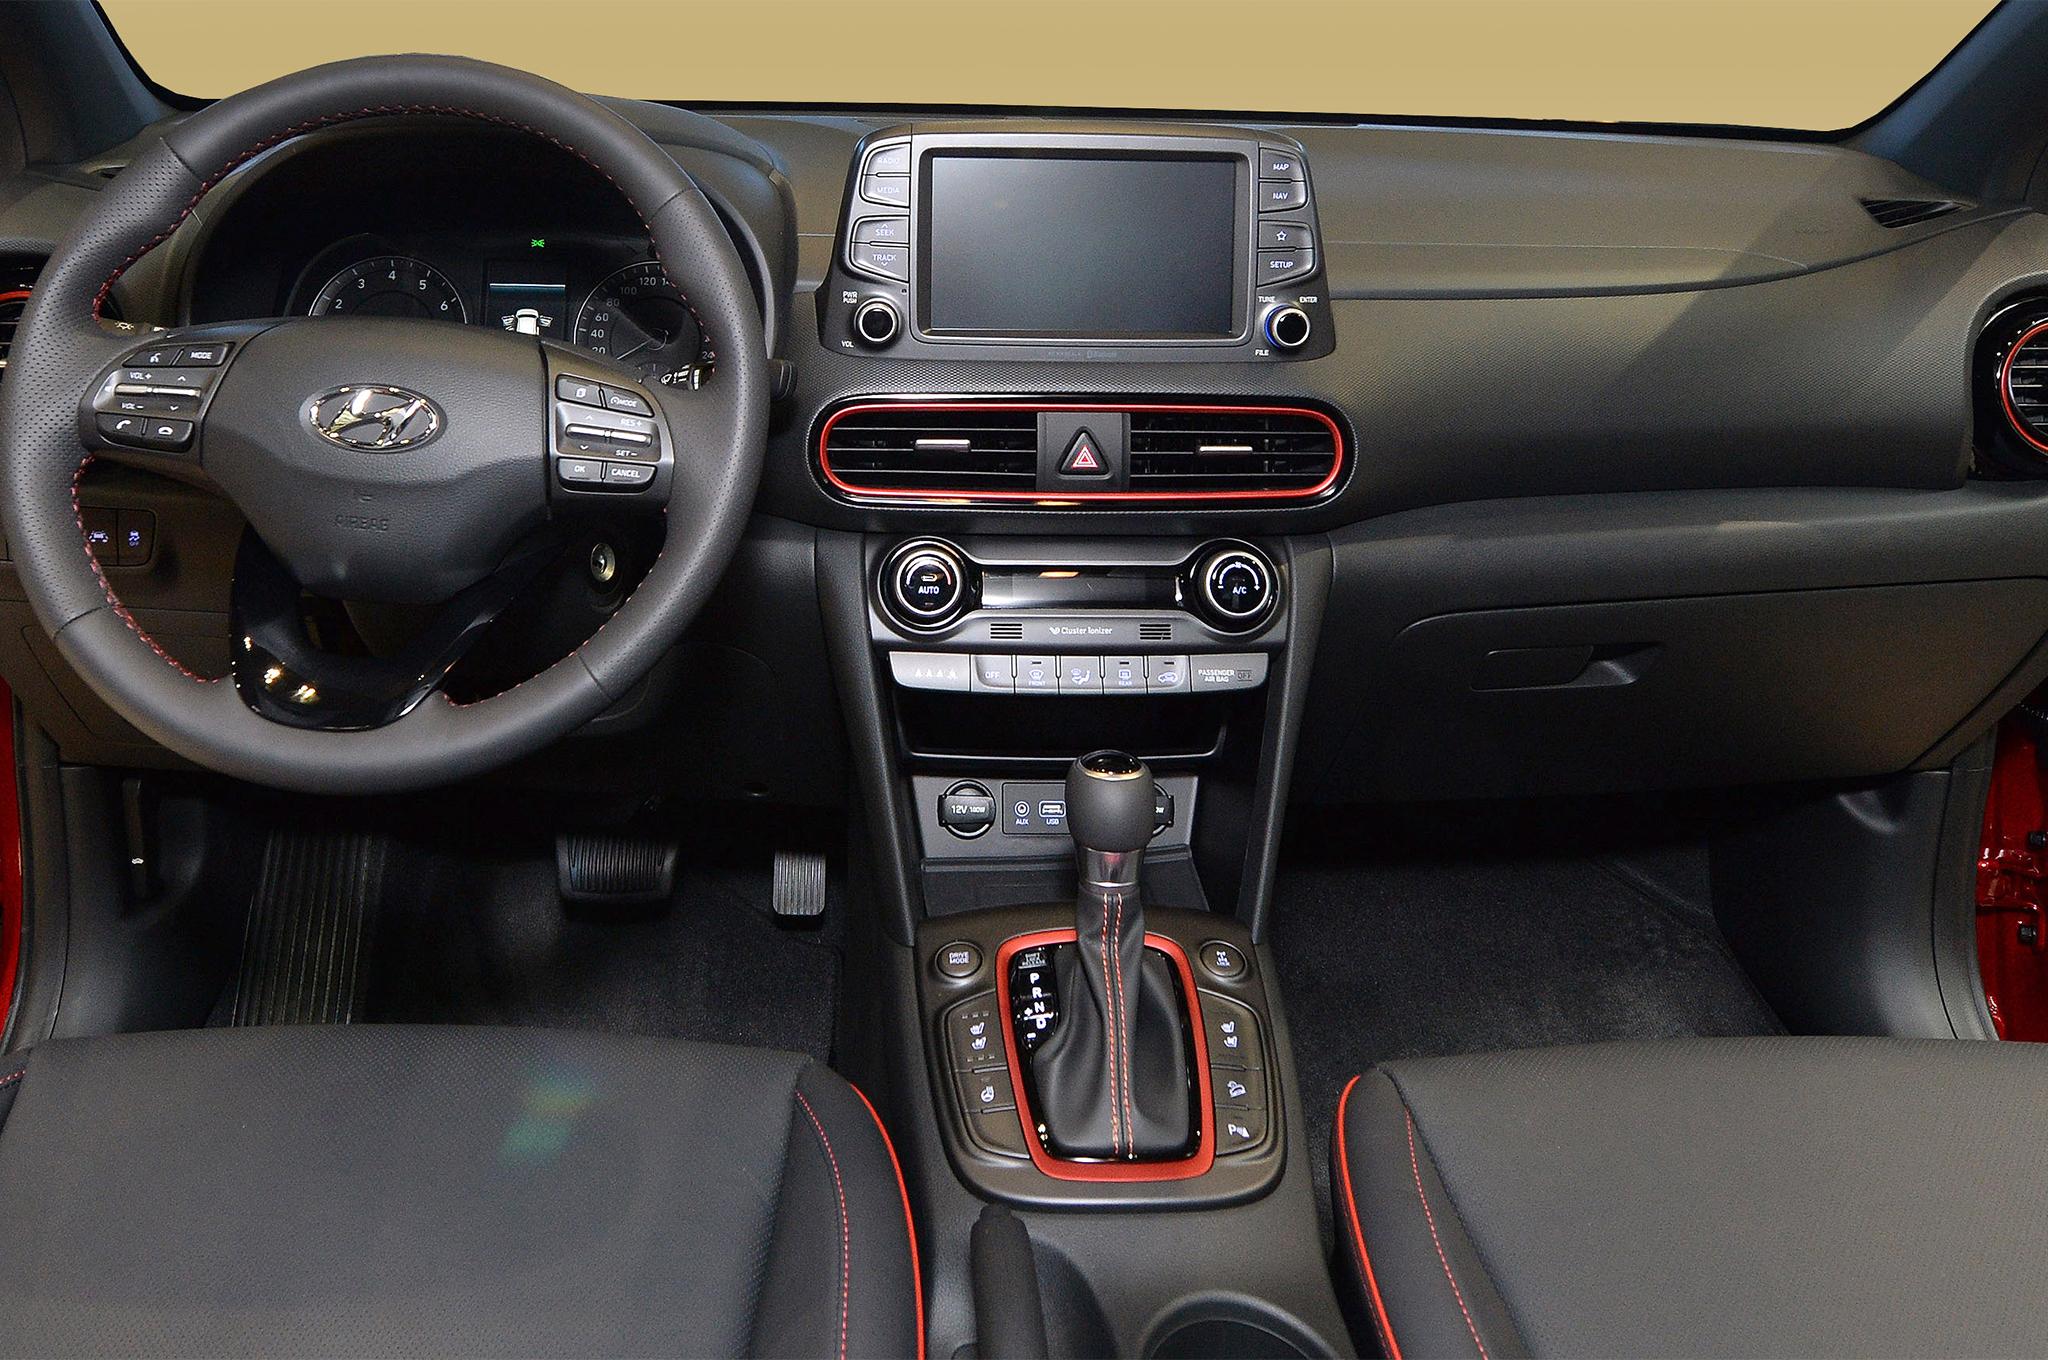 2018 Hyundai Kona Price Specs Interior Design